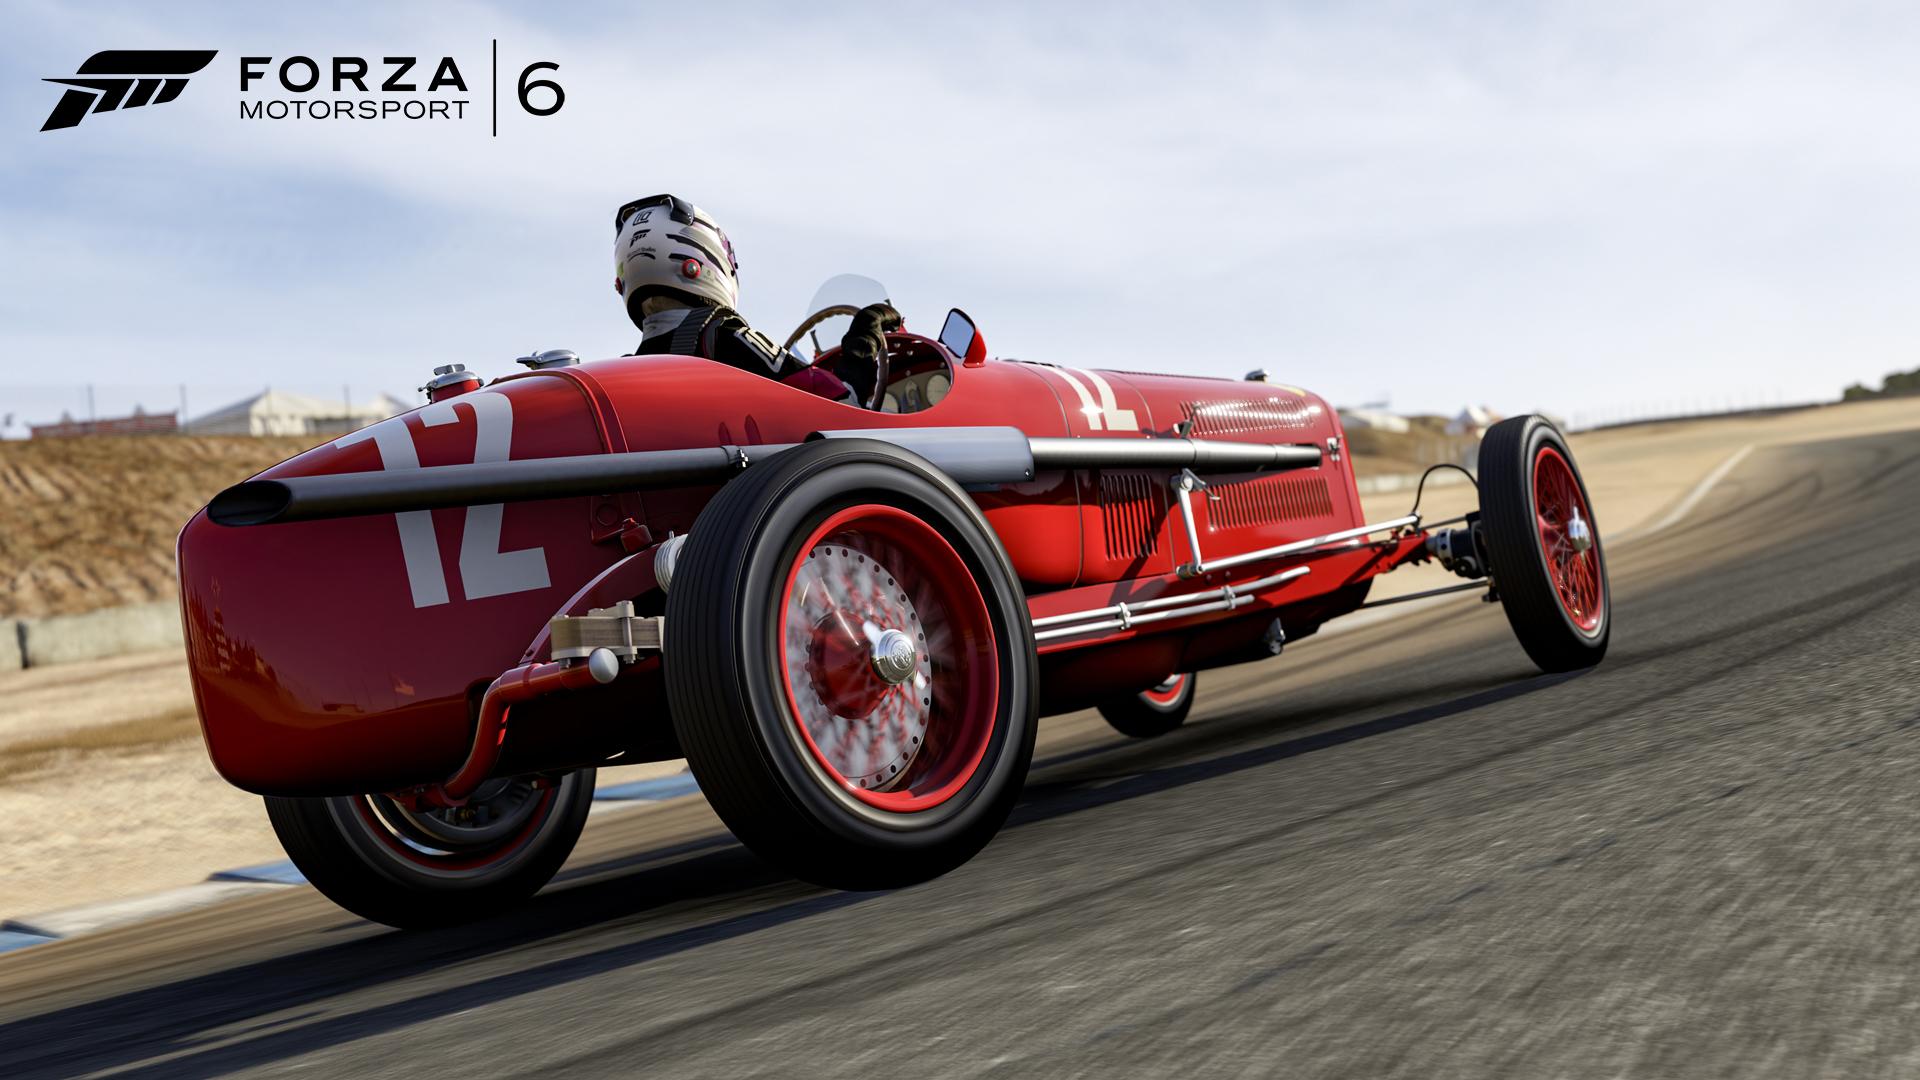 Forza Motorsport Stránka 7 Xbox e hry Console Forum